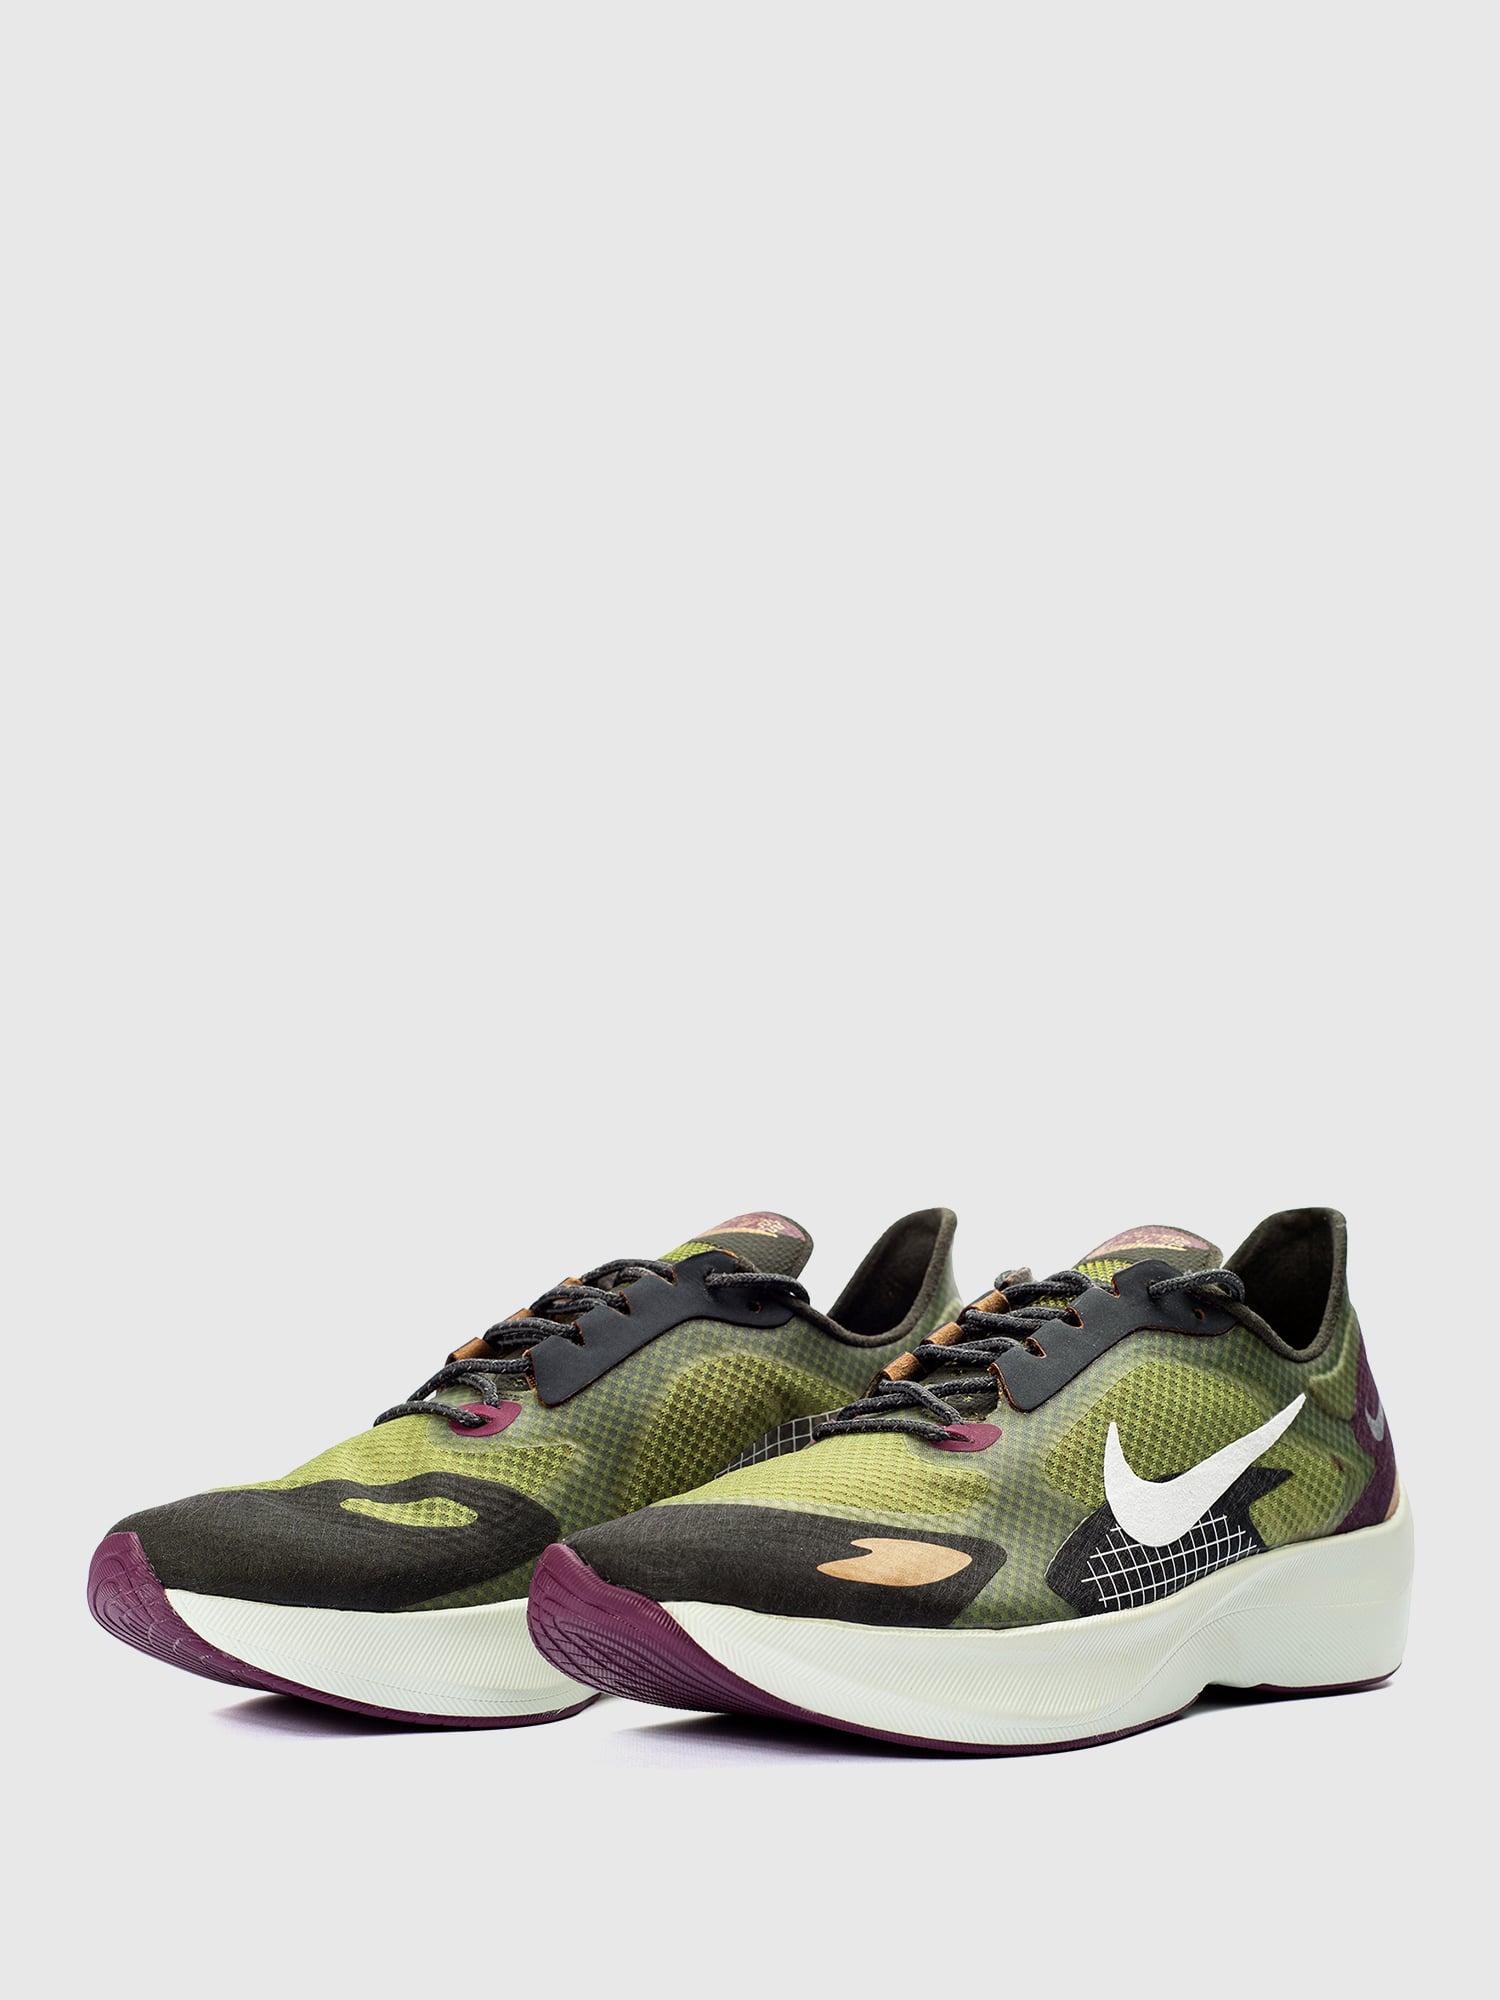 Nike Vapor Street Peg Cargo Khaki